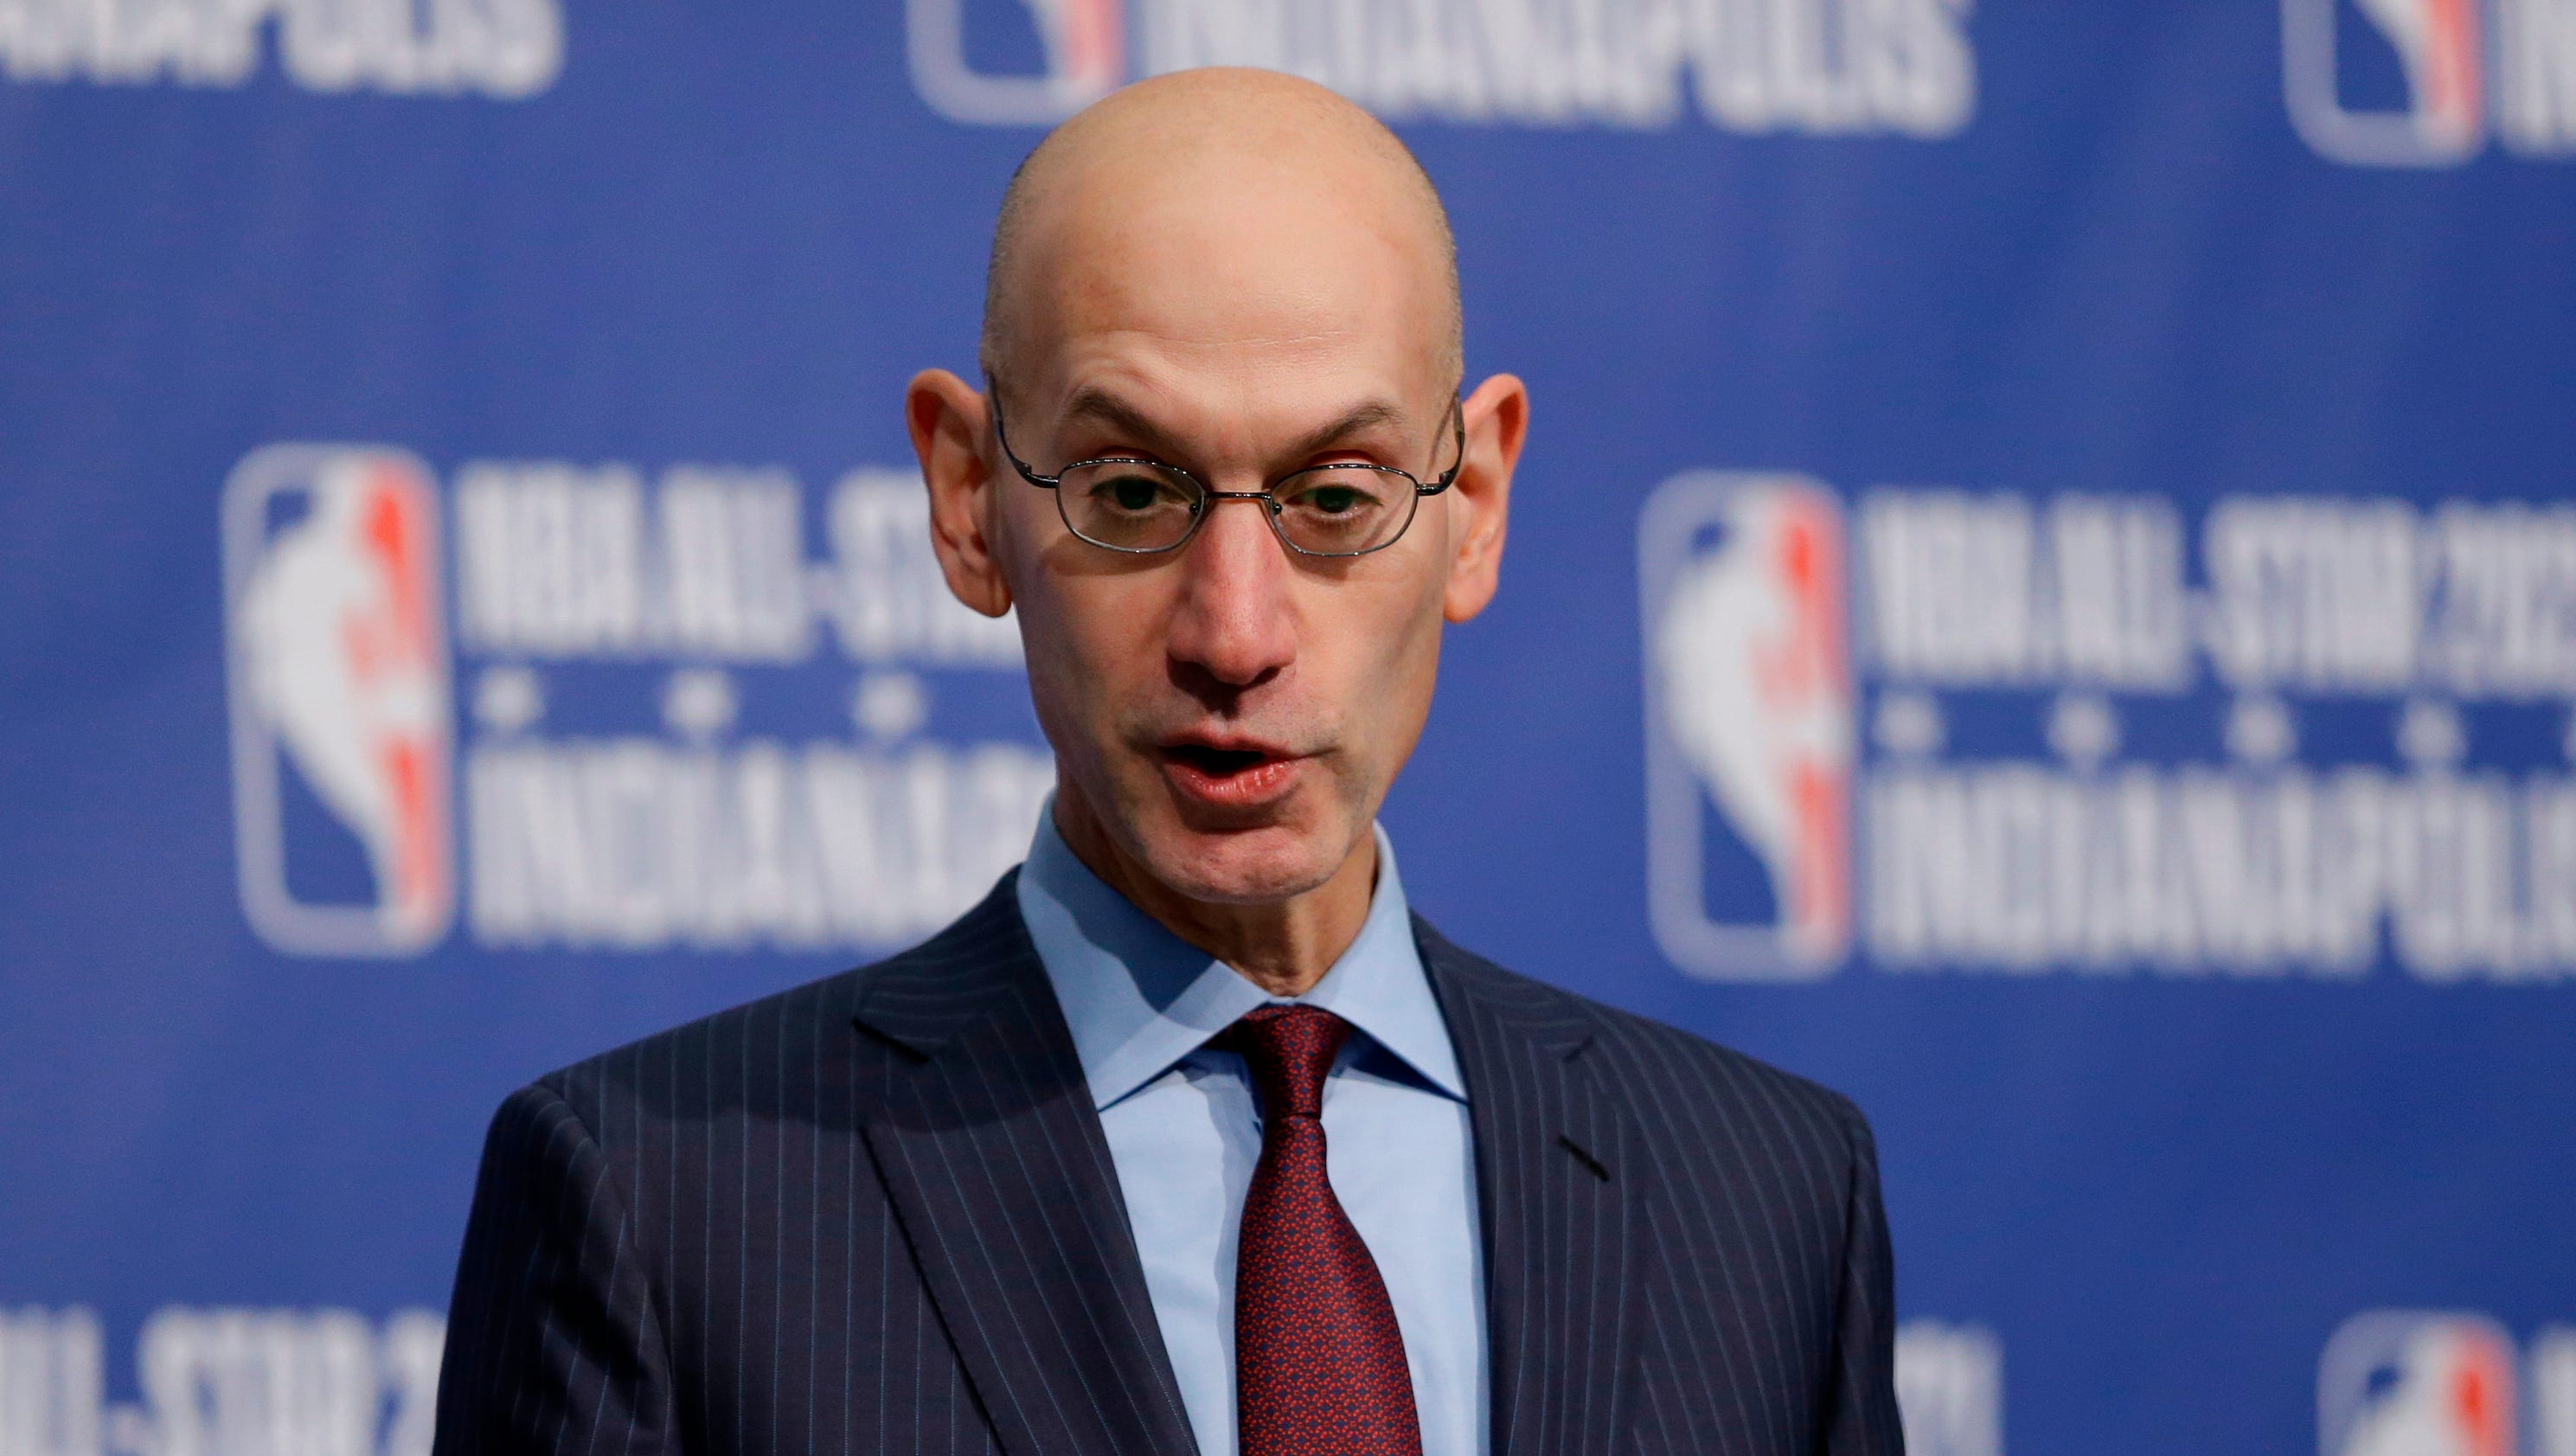 636603763090519266-ap-college-corruption-nba-basketball